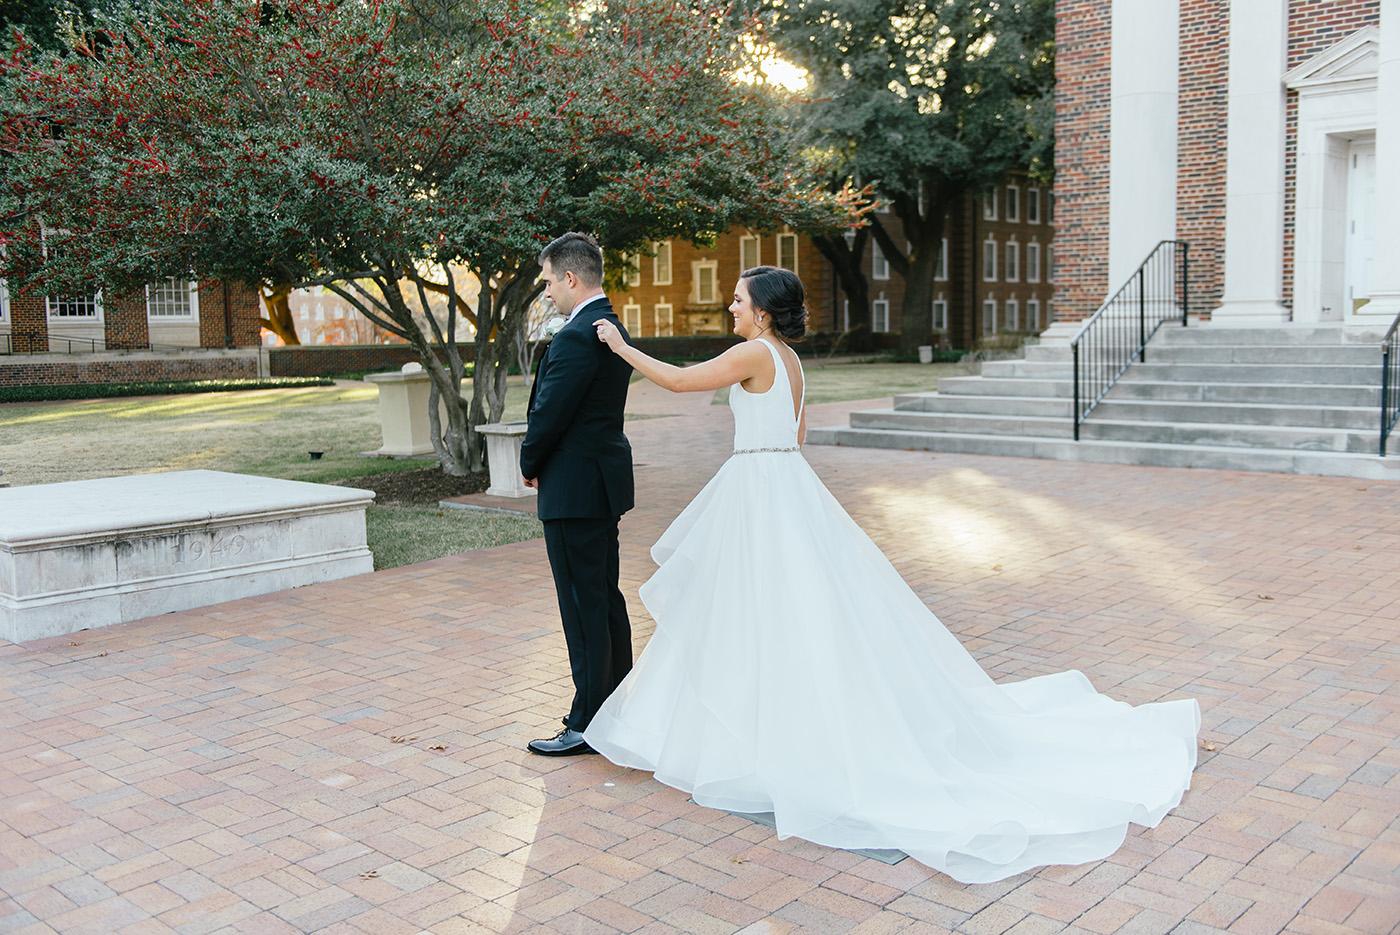 Dallas Wedding Planner - Winter Wedding at The Room on Main - Allday Events - 104.jpg